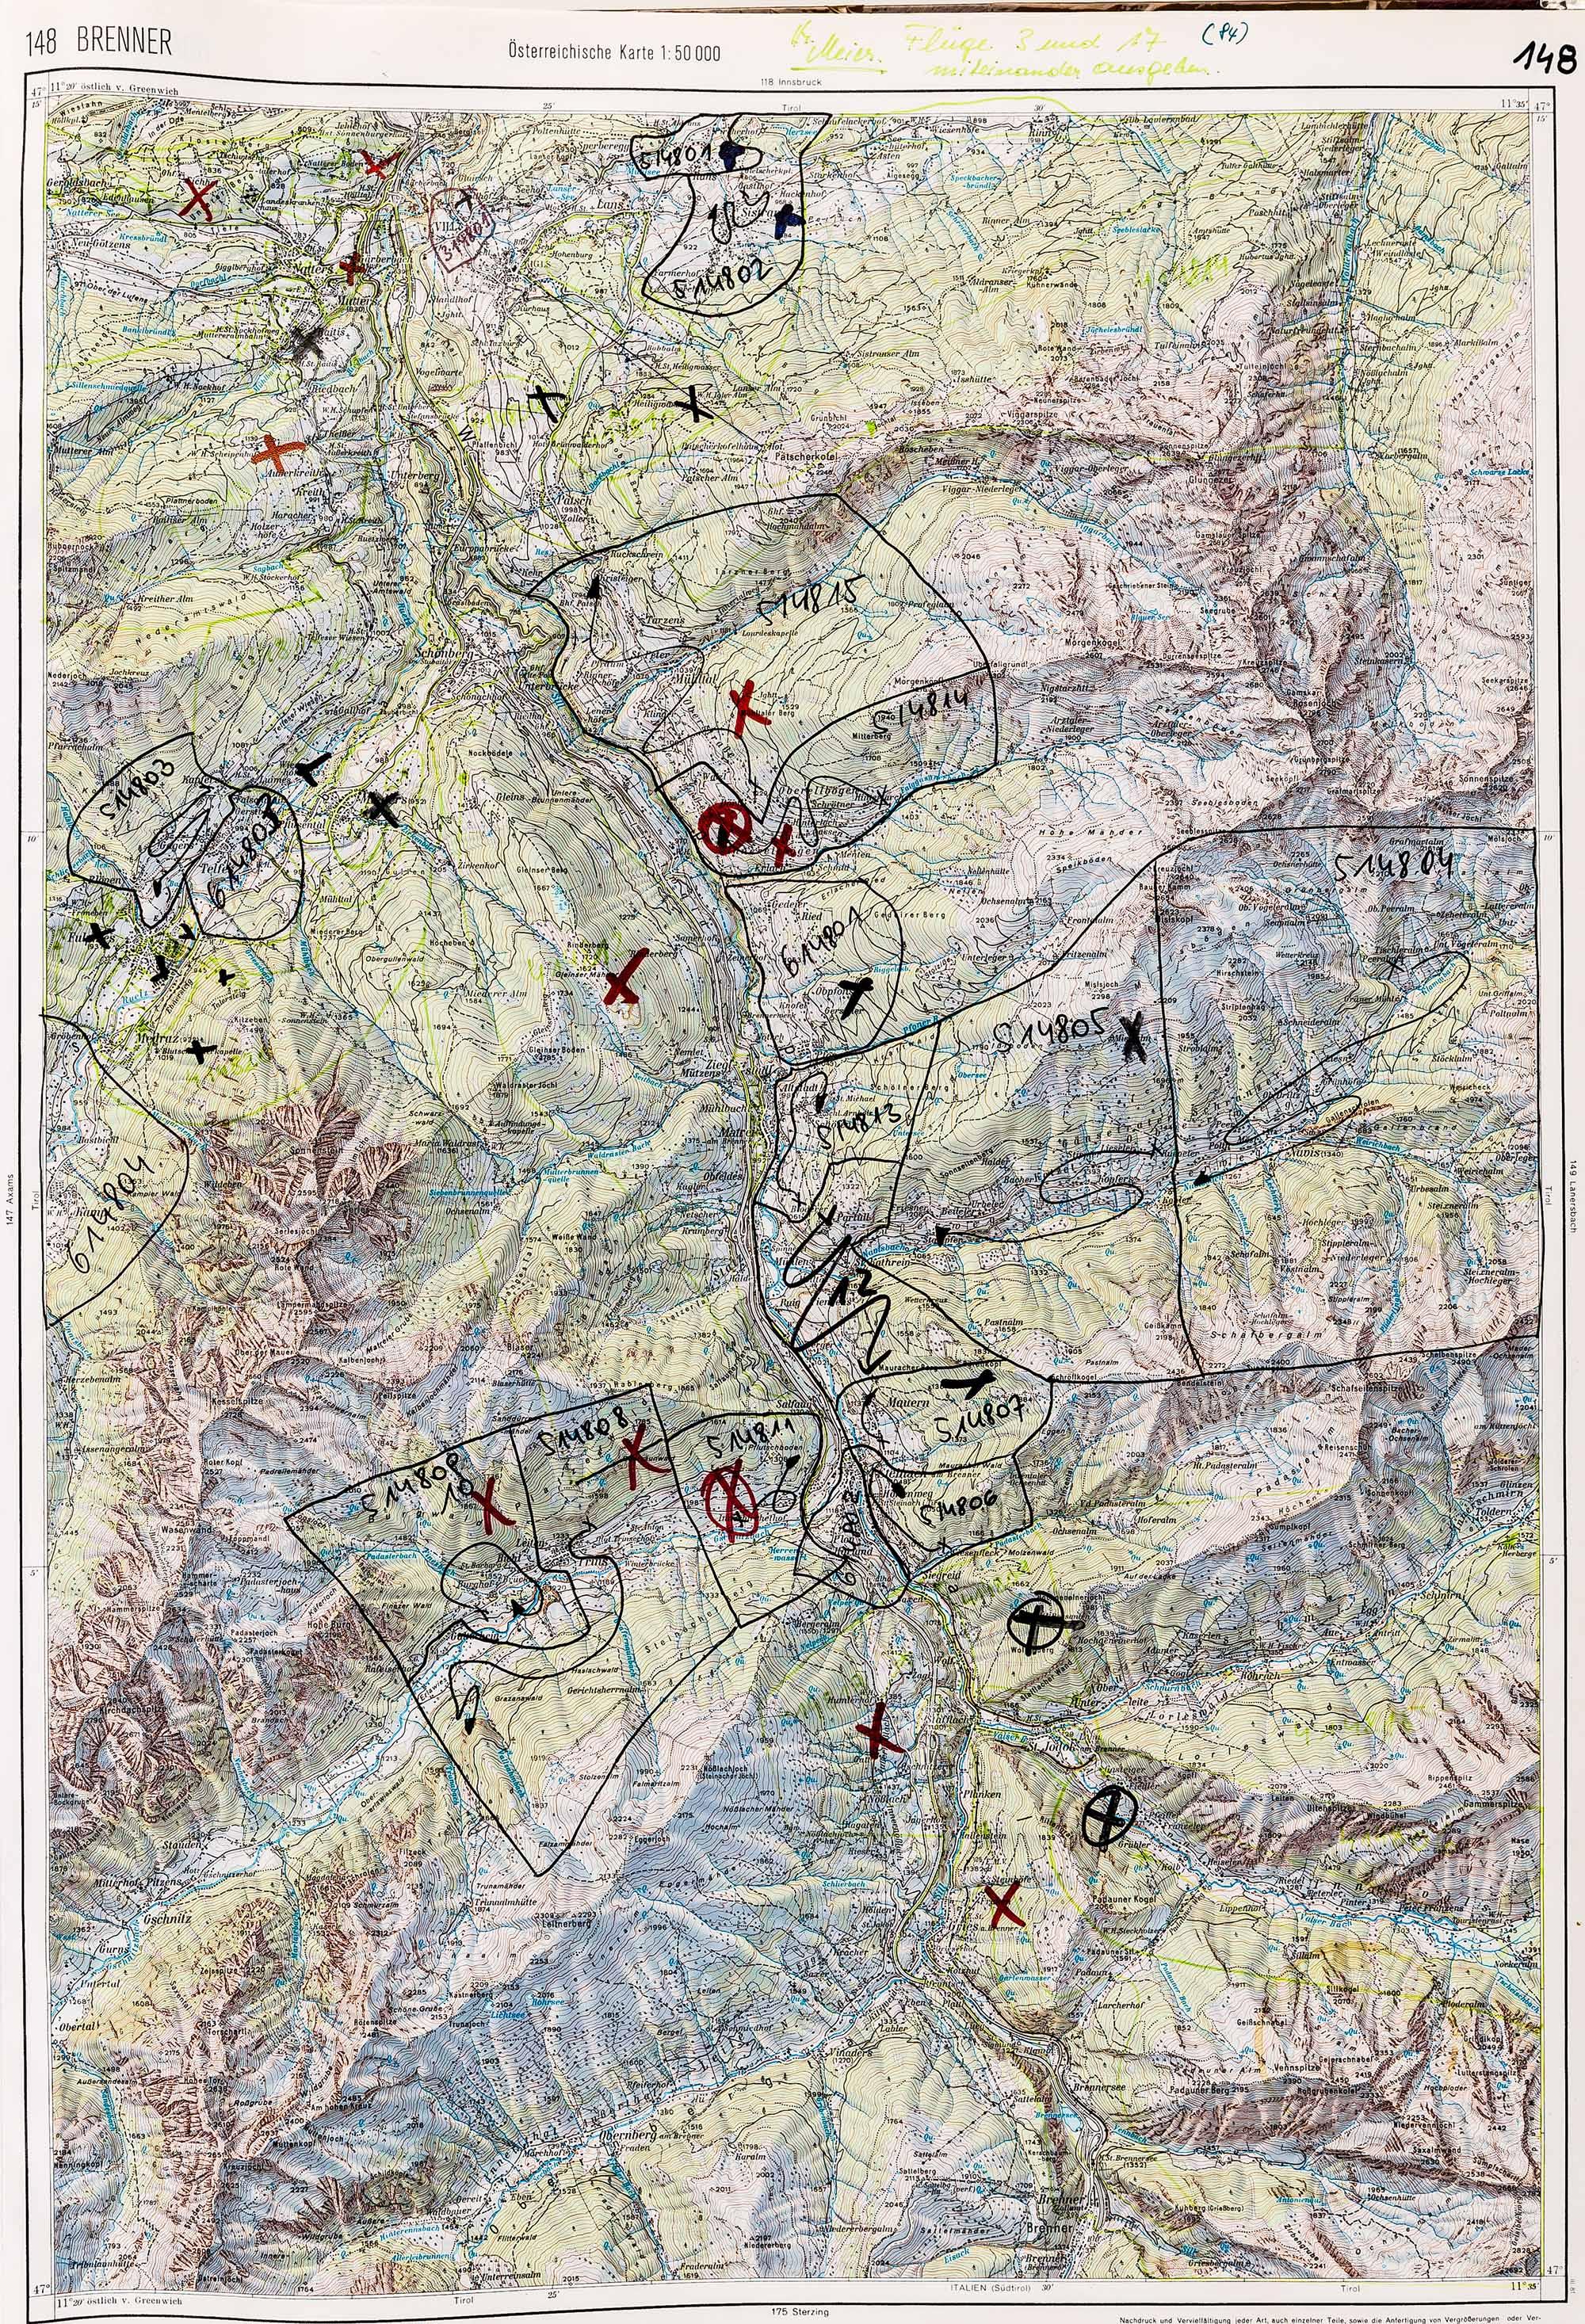 1983-1986 Karte 148